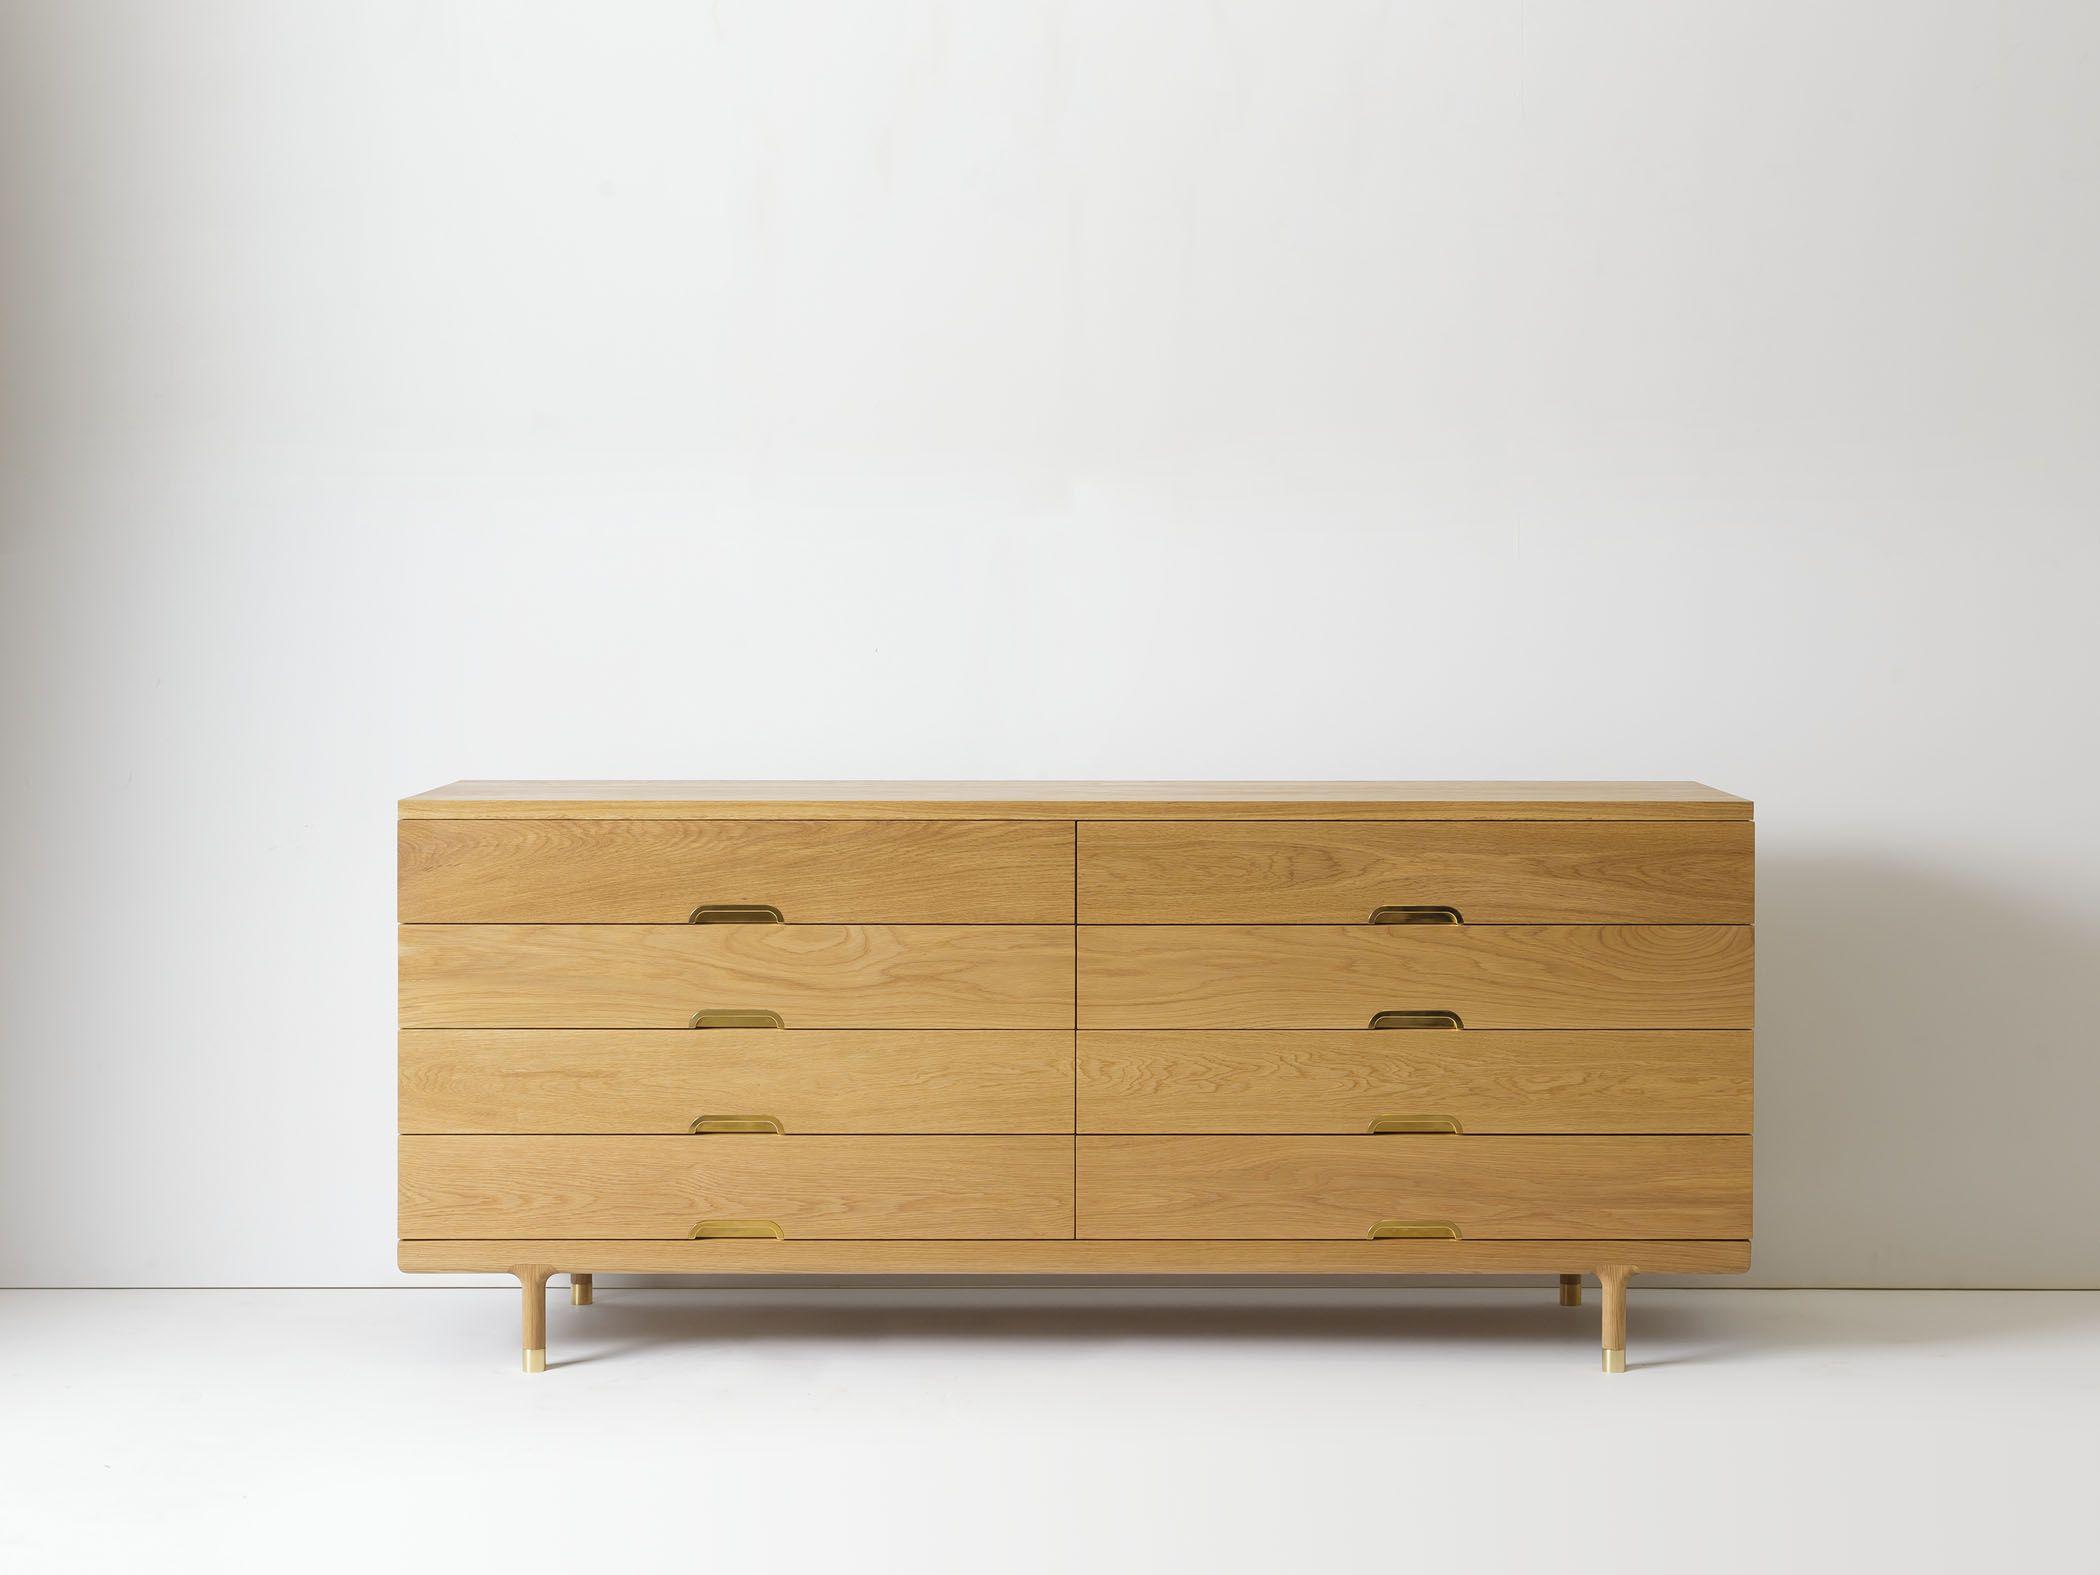 Simple Dresser Modern Solid Wood Dresser Kalon Studios Us Simple Dresser Solid Wood Dresser Modern Dresser Real wood chest of drawers